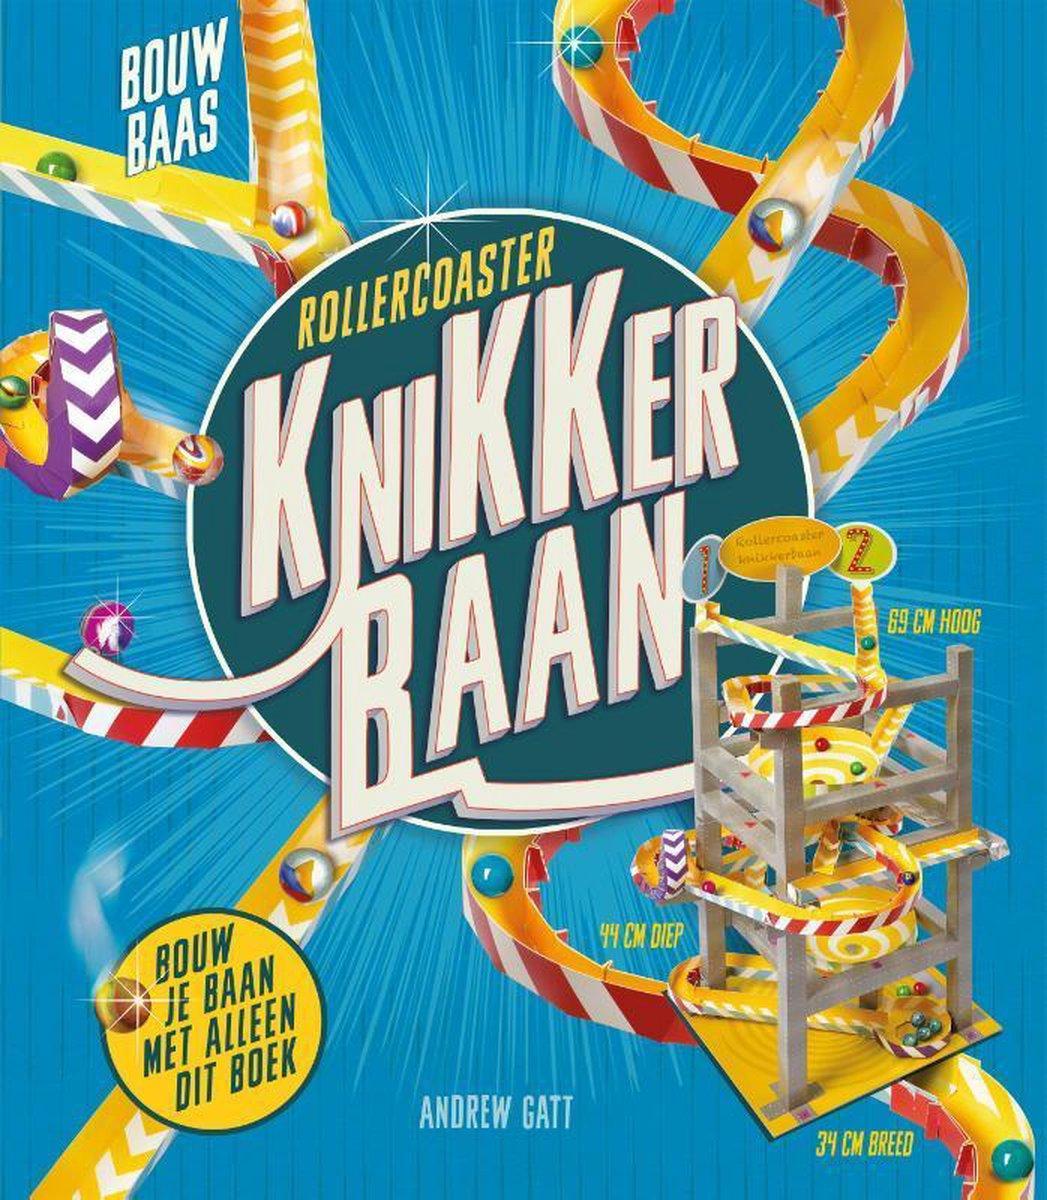 Rollercoaster knikkerbaan